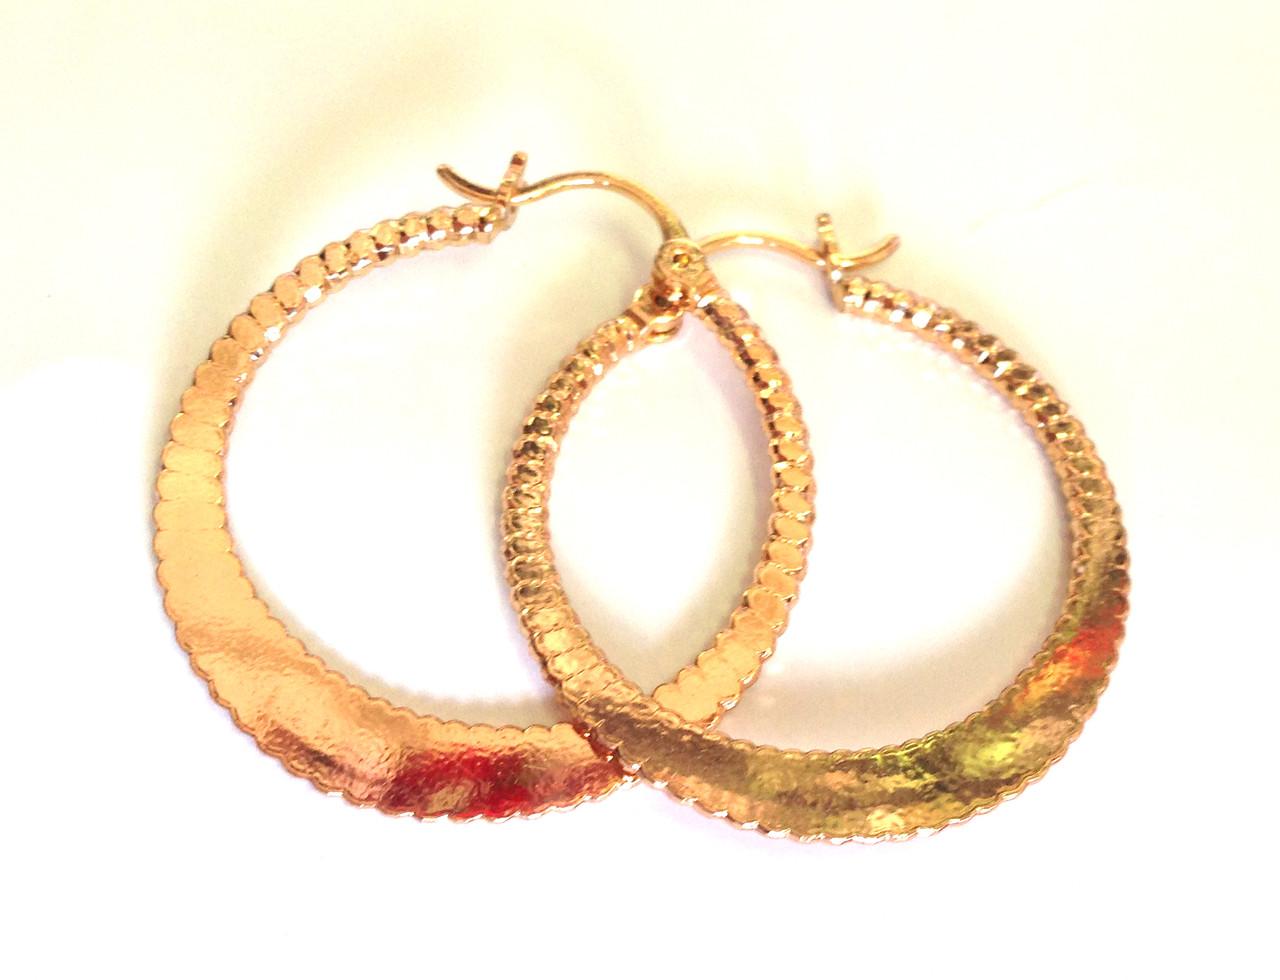 Серьги плоские кольца Хuping Jewelry 18 к, позолота